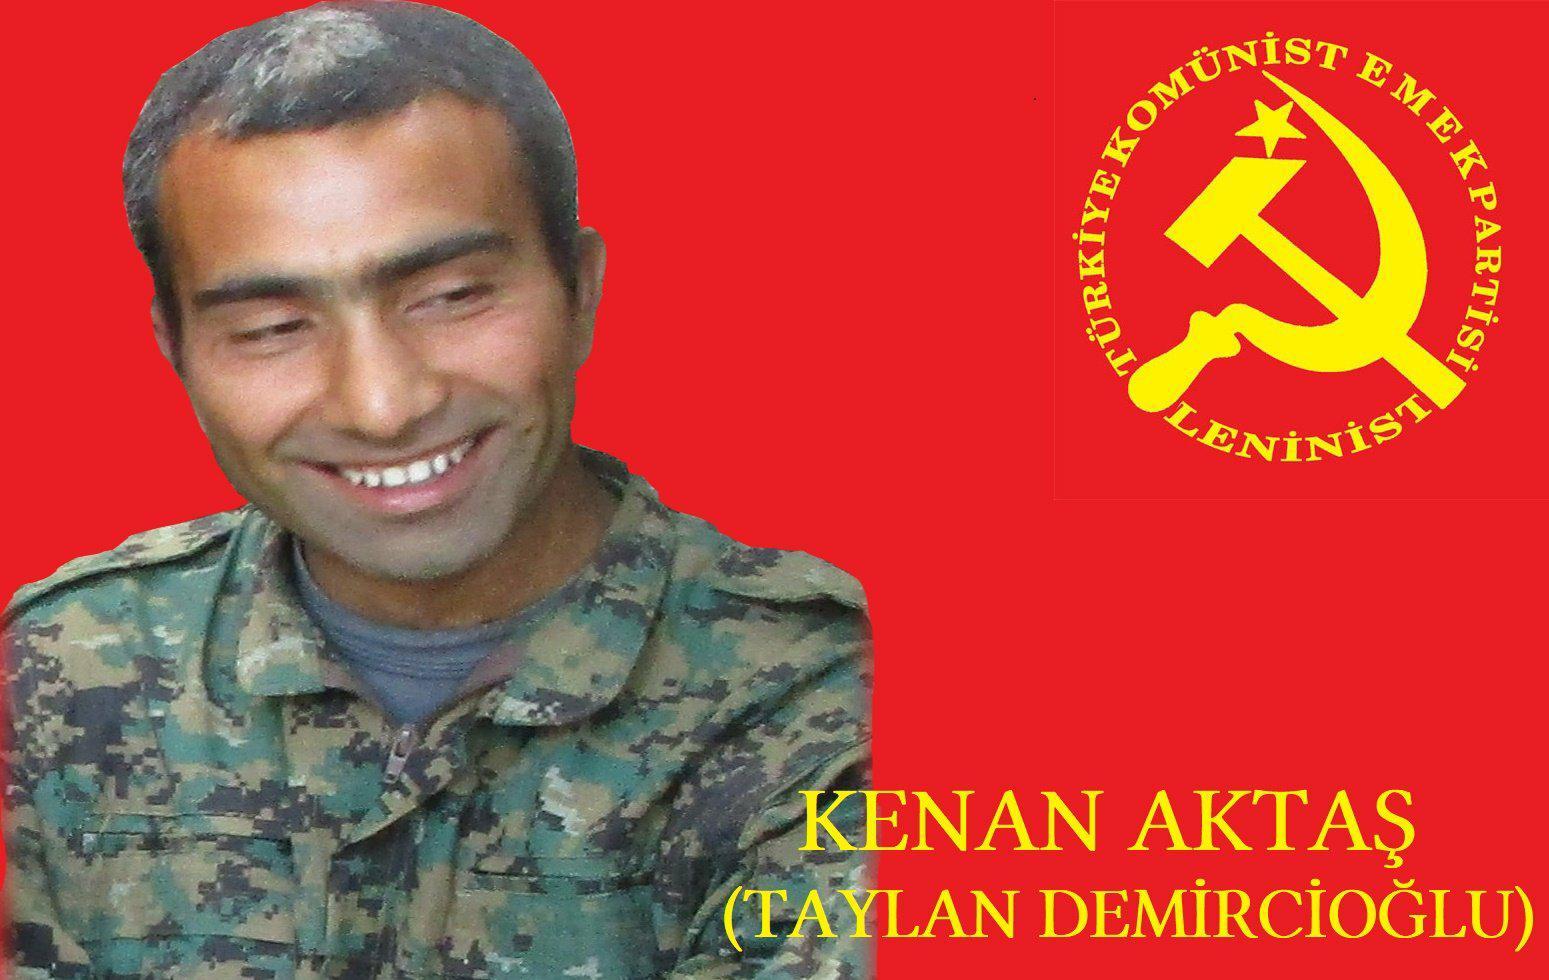 Kenan Aktaş, combattant du TKEP/L